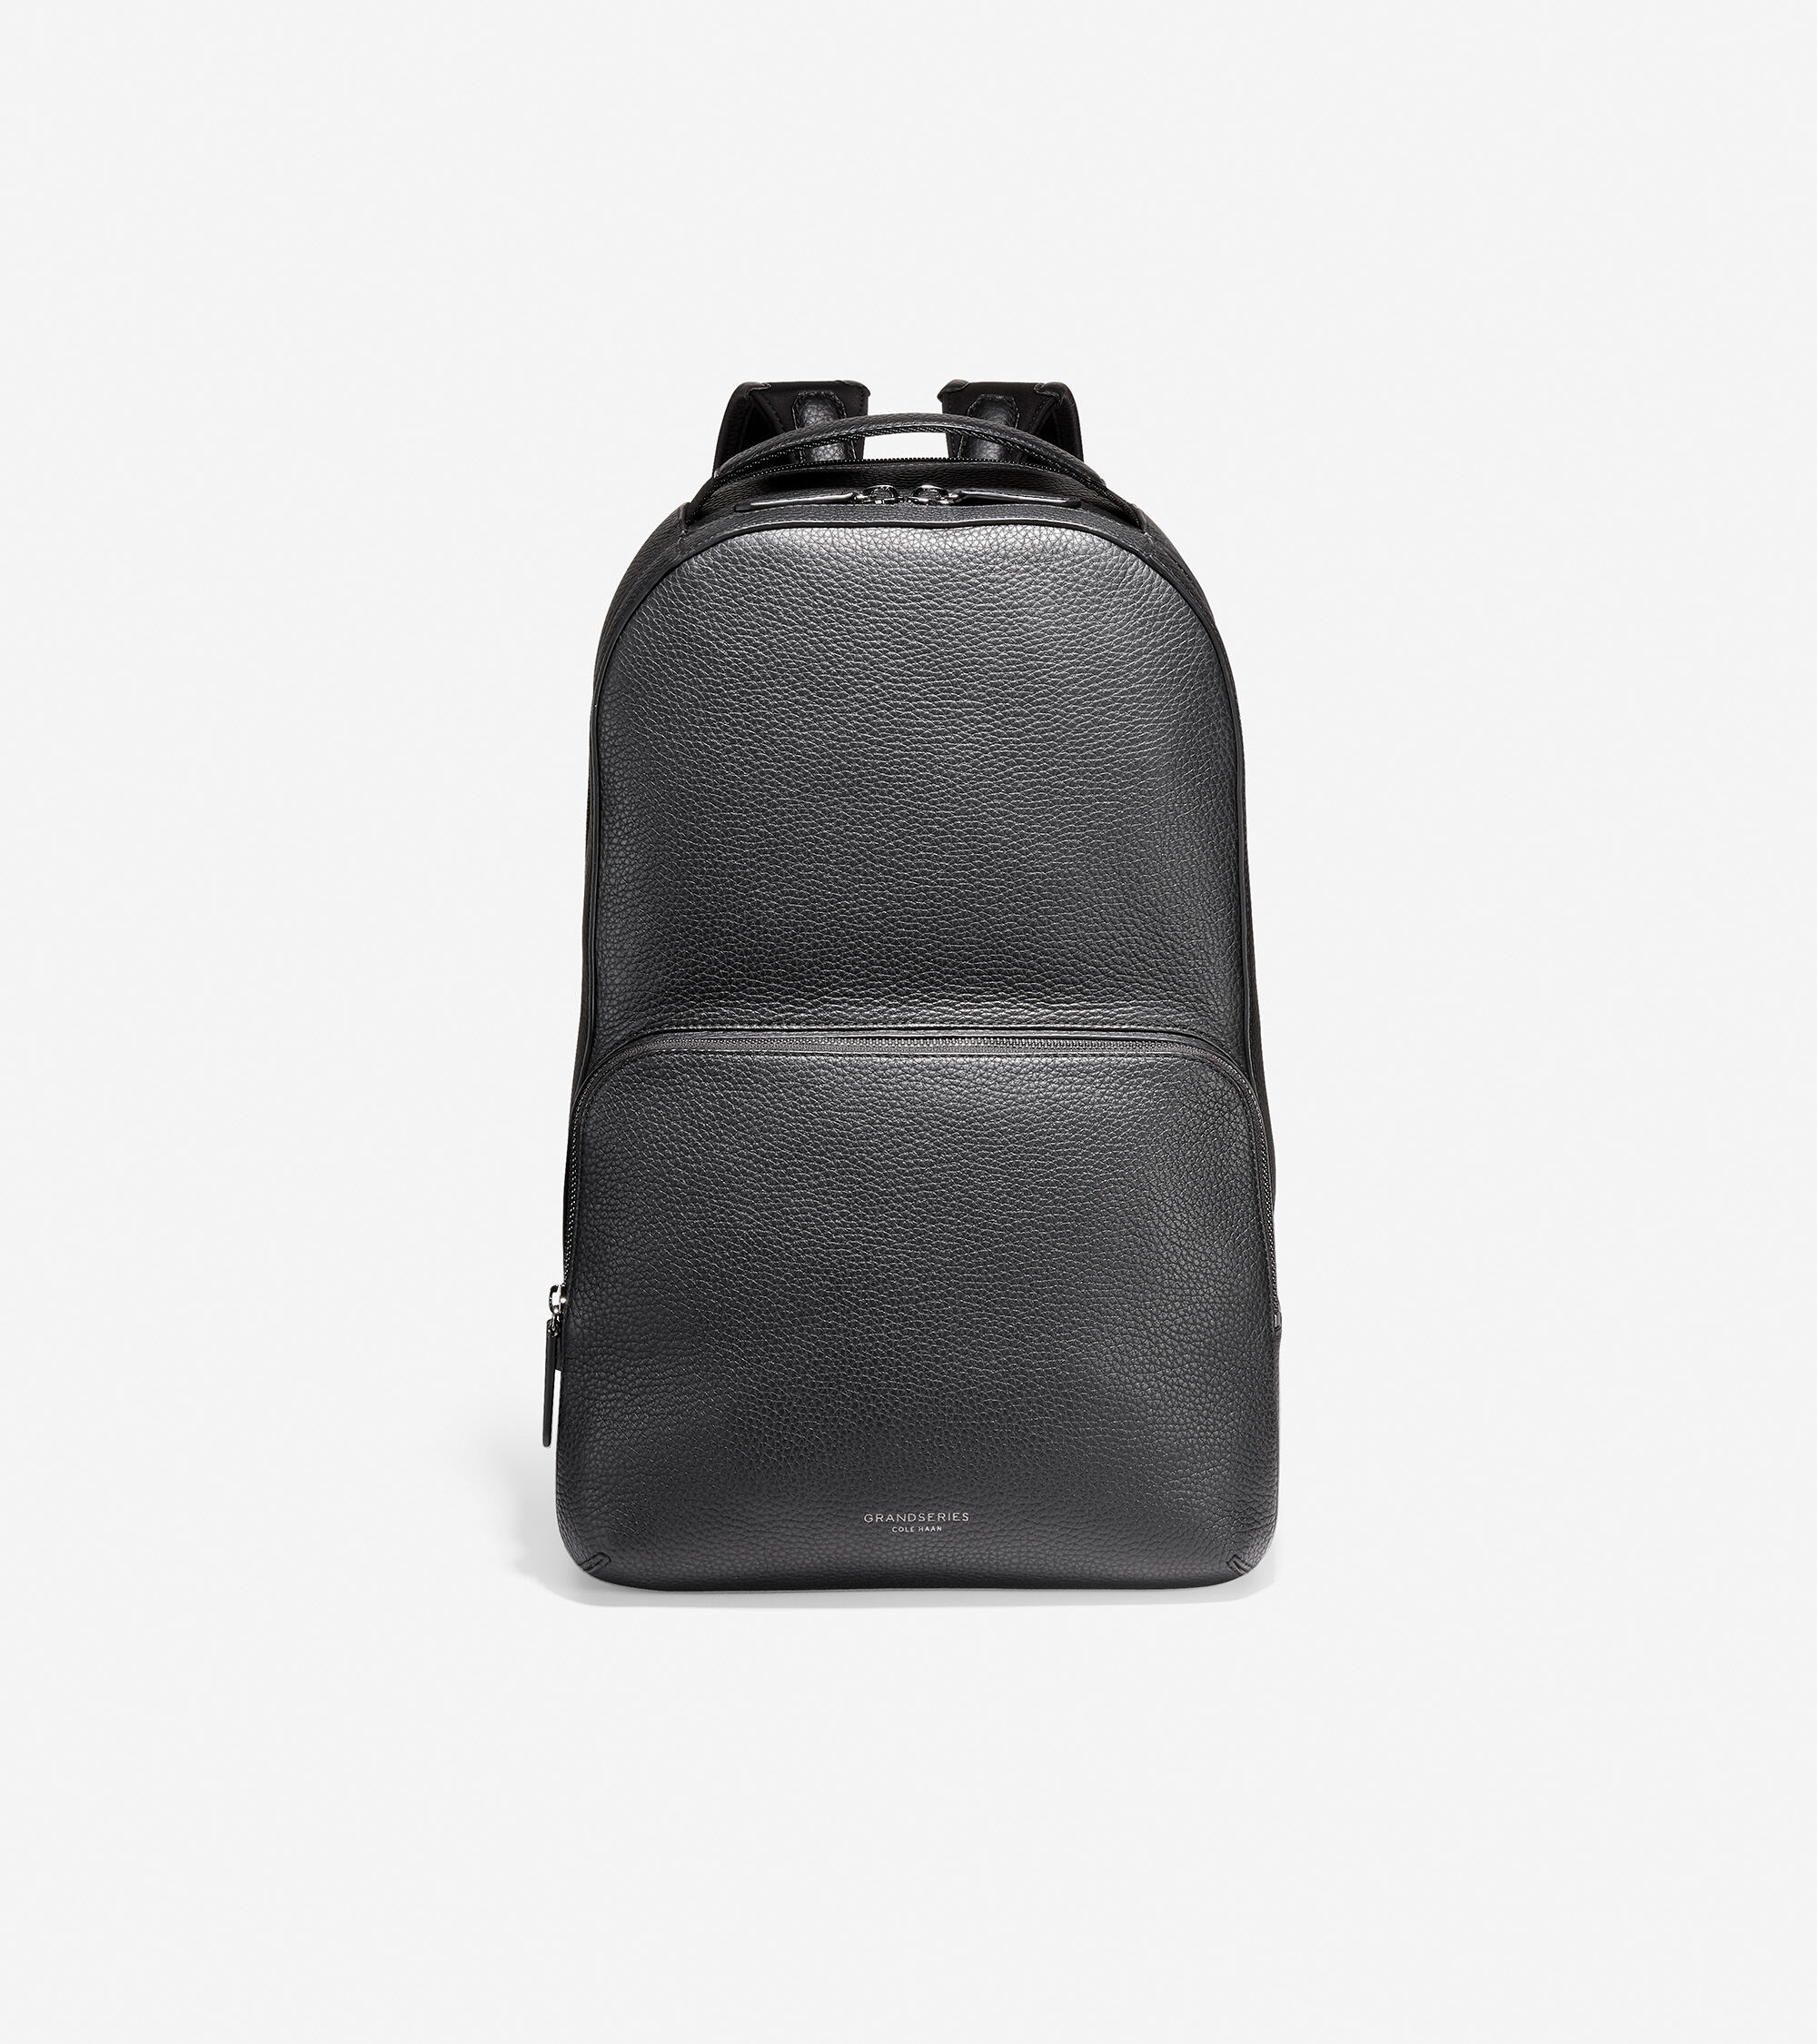 Men's GRANDSERIES Leather Backpack in